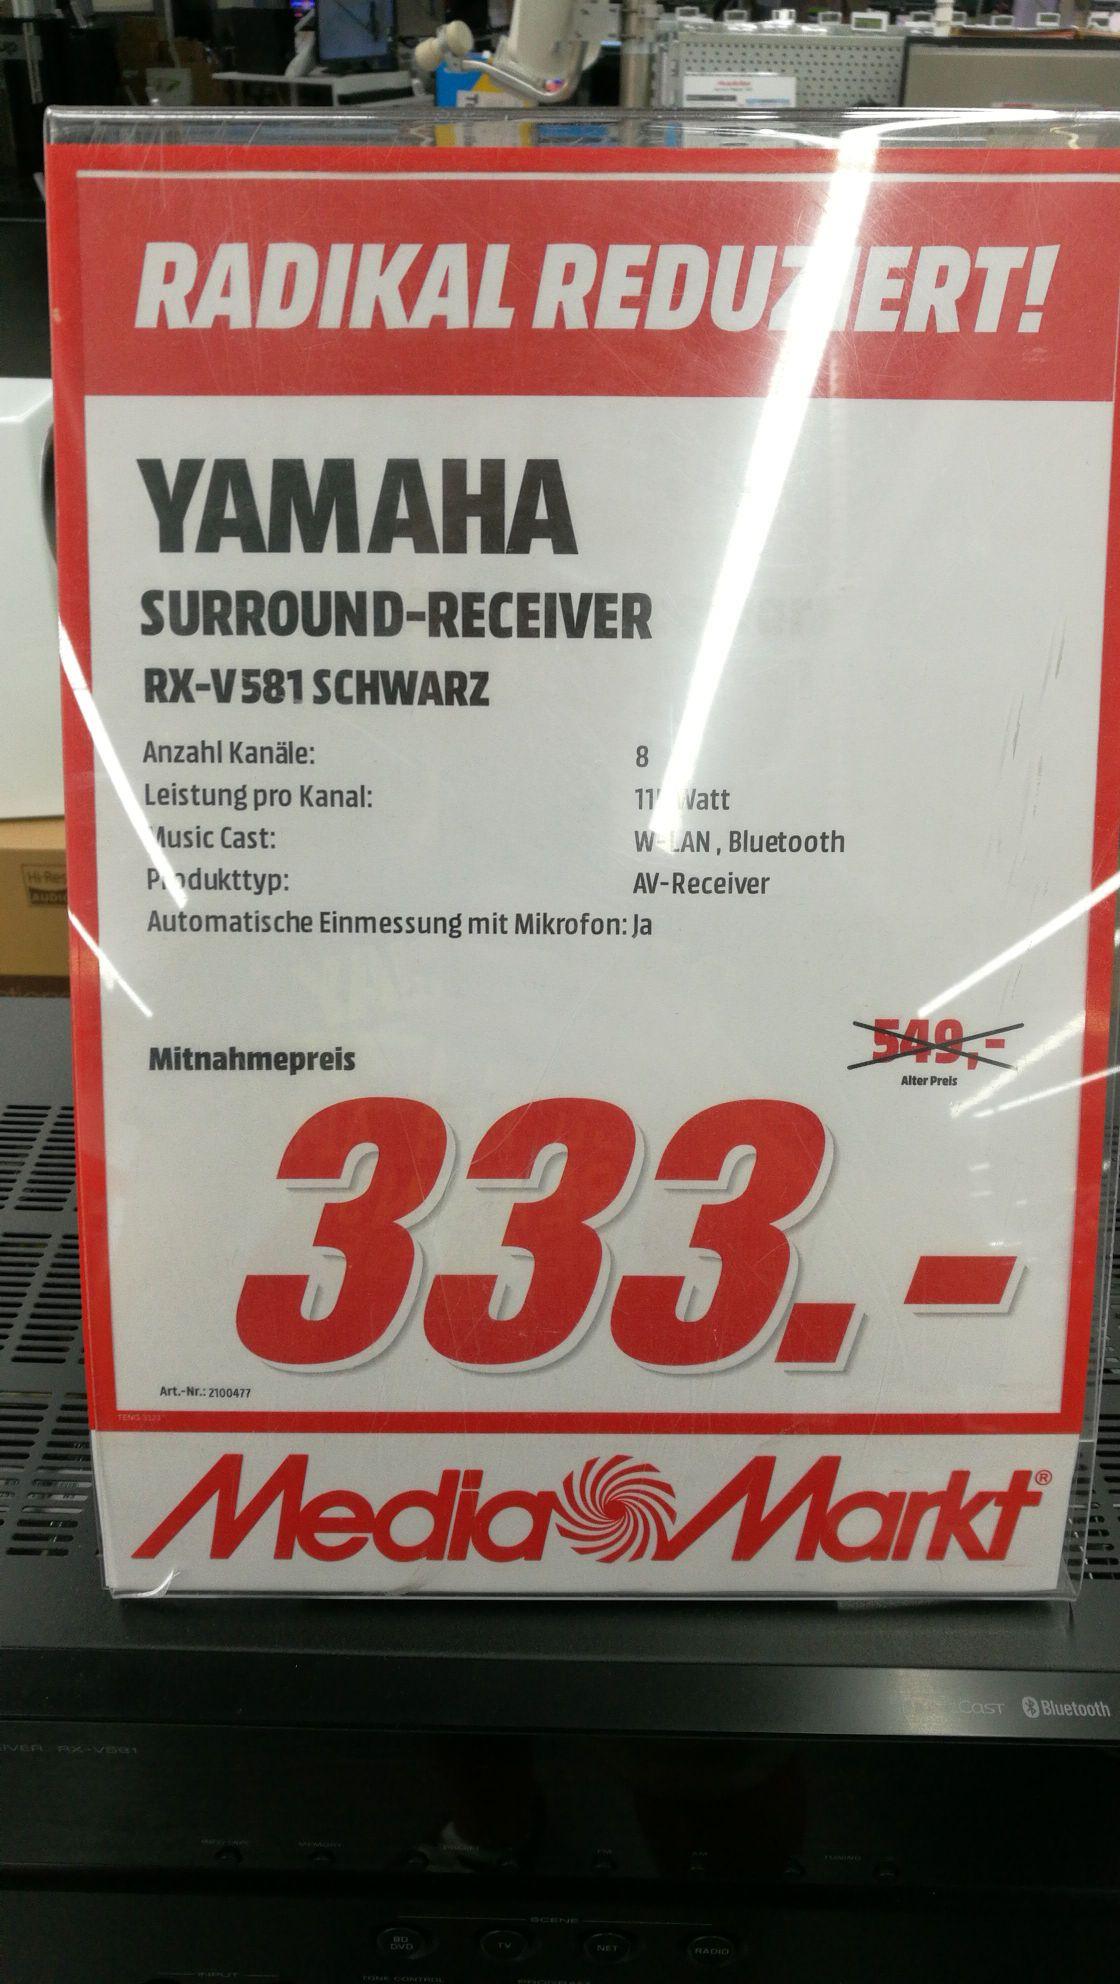 [Media Markt Berlin im Alexa] Yamaha RX-V581 Schwarz